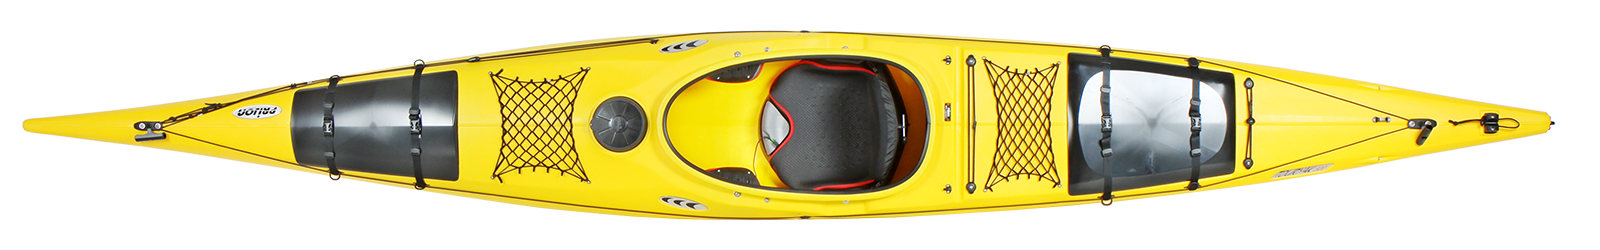 туристически каяк Touryak 500 жълт